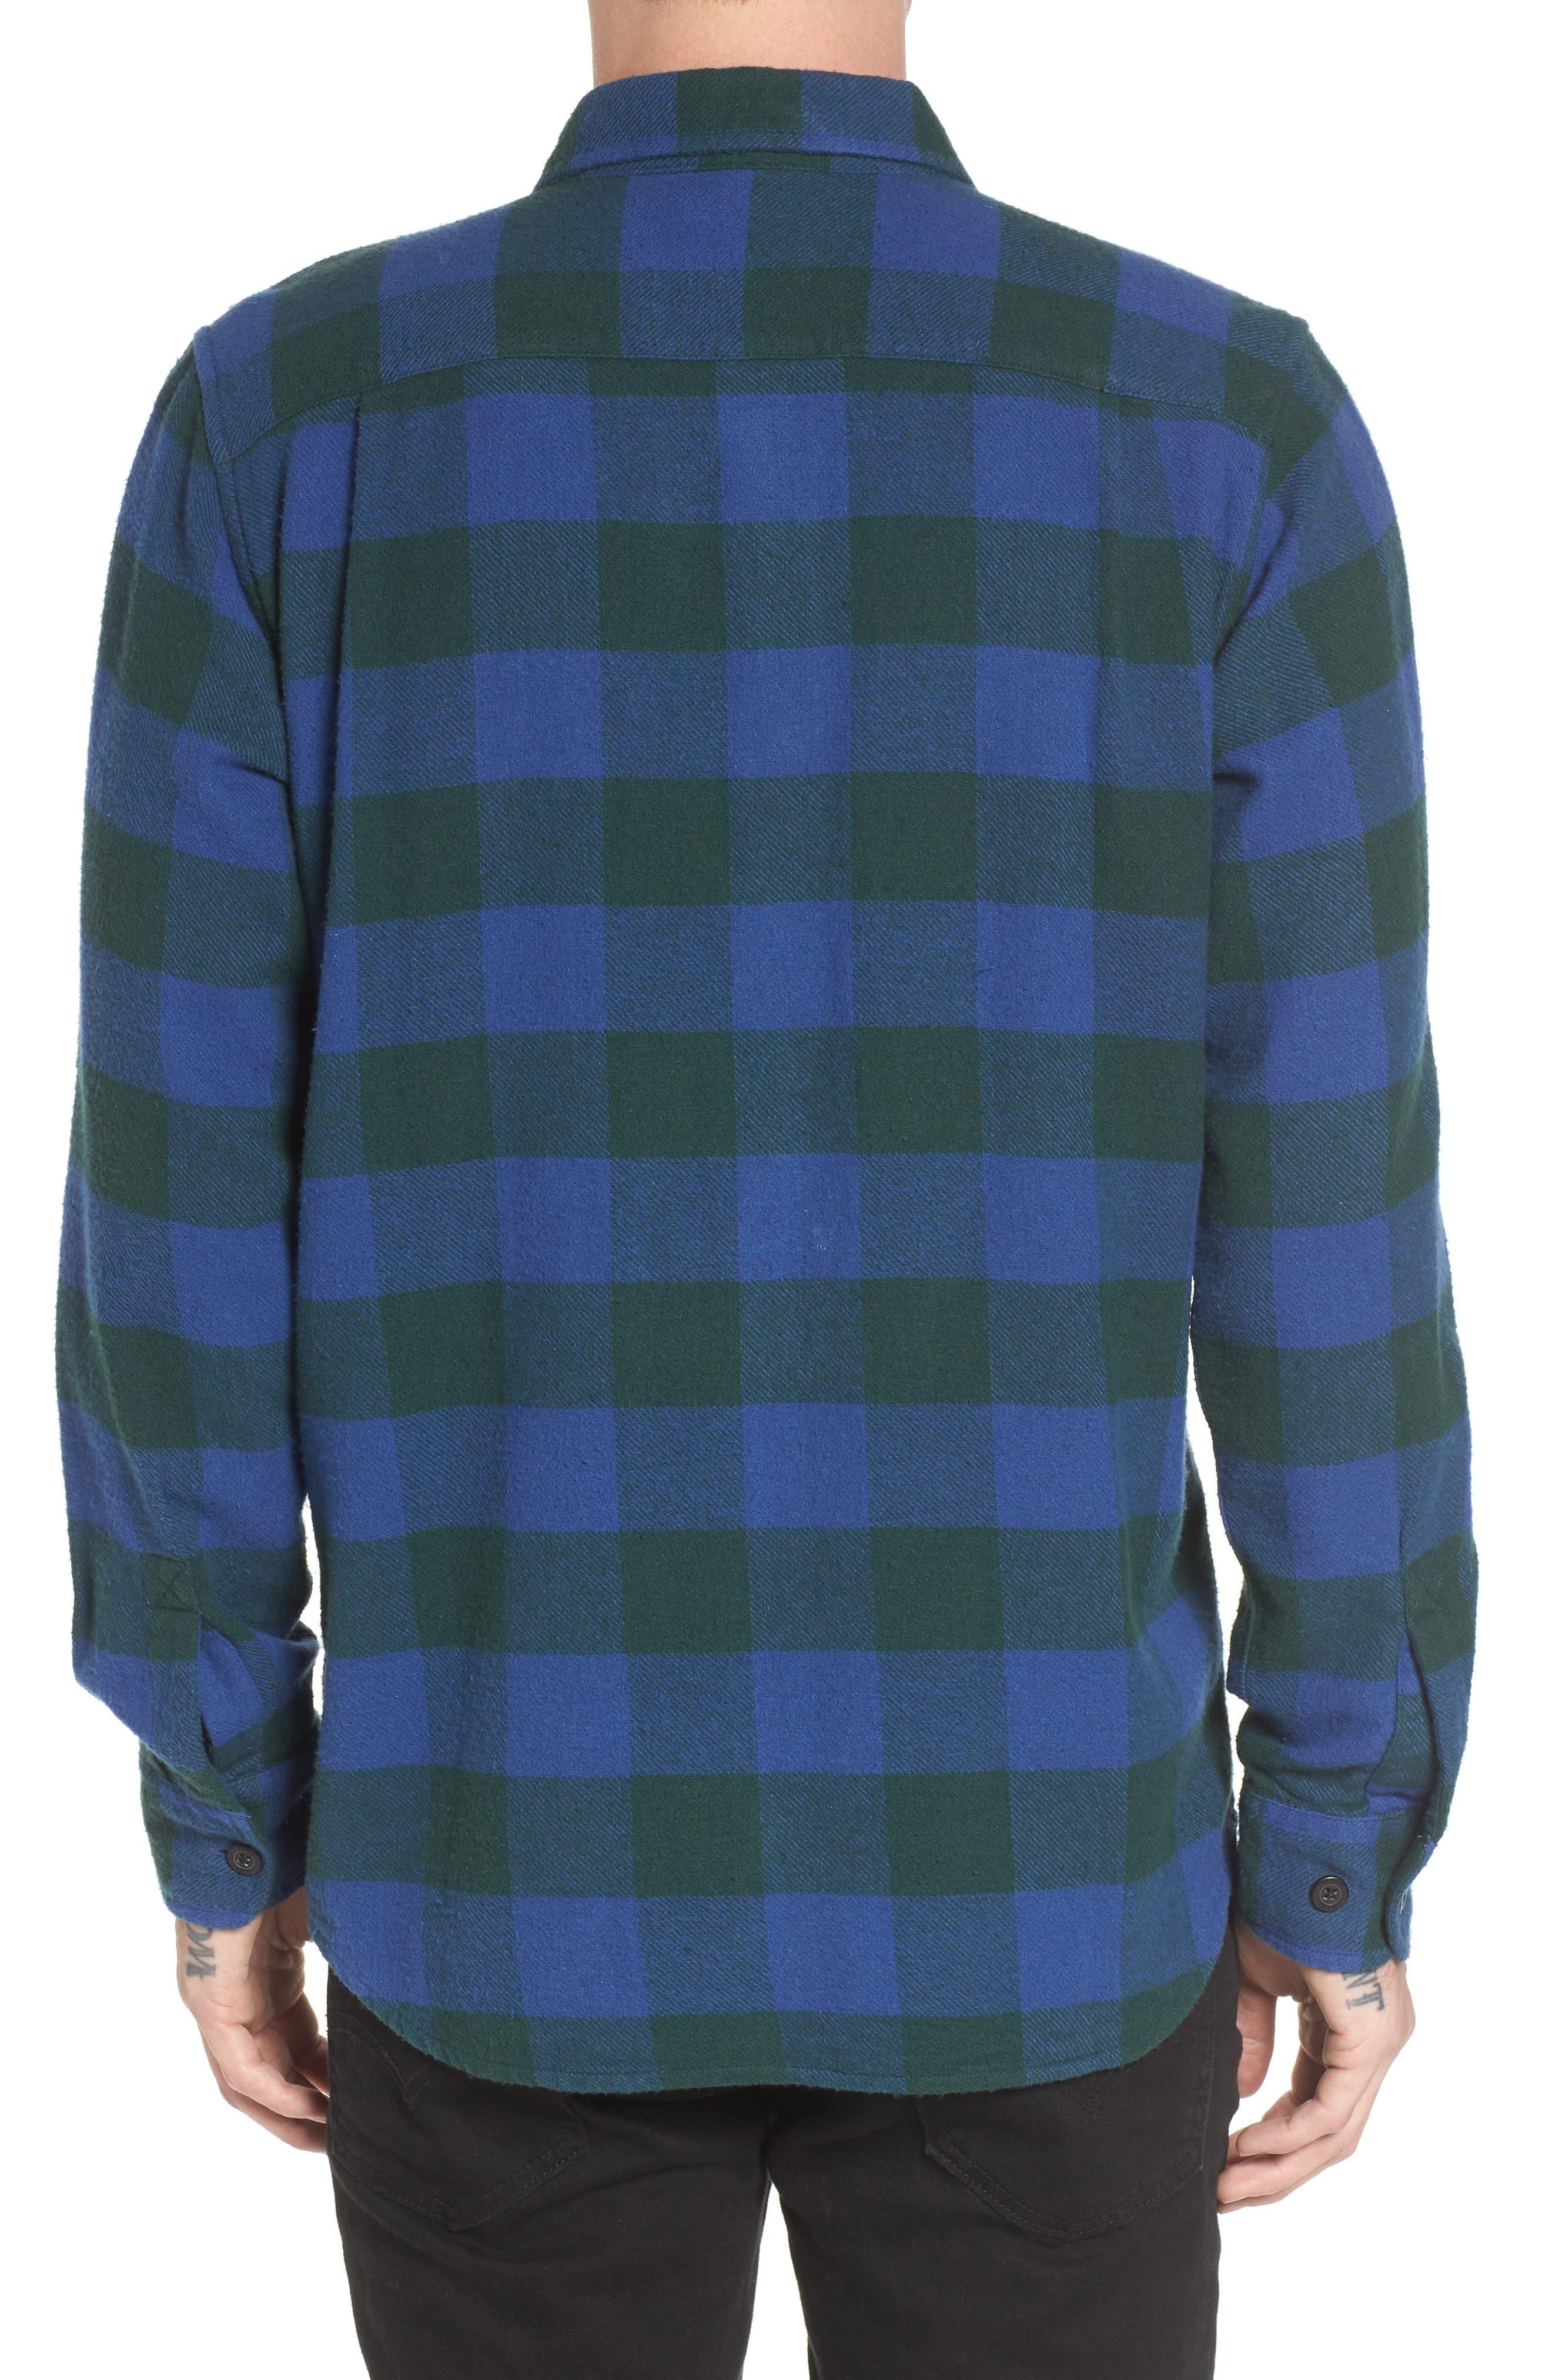 Trent Check Woven Shirt,                             Alternate thumbnail 2, color,                             Navy Multi